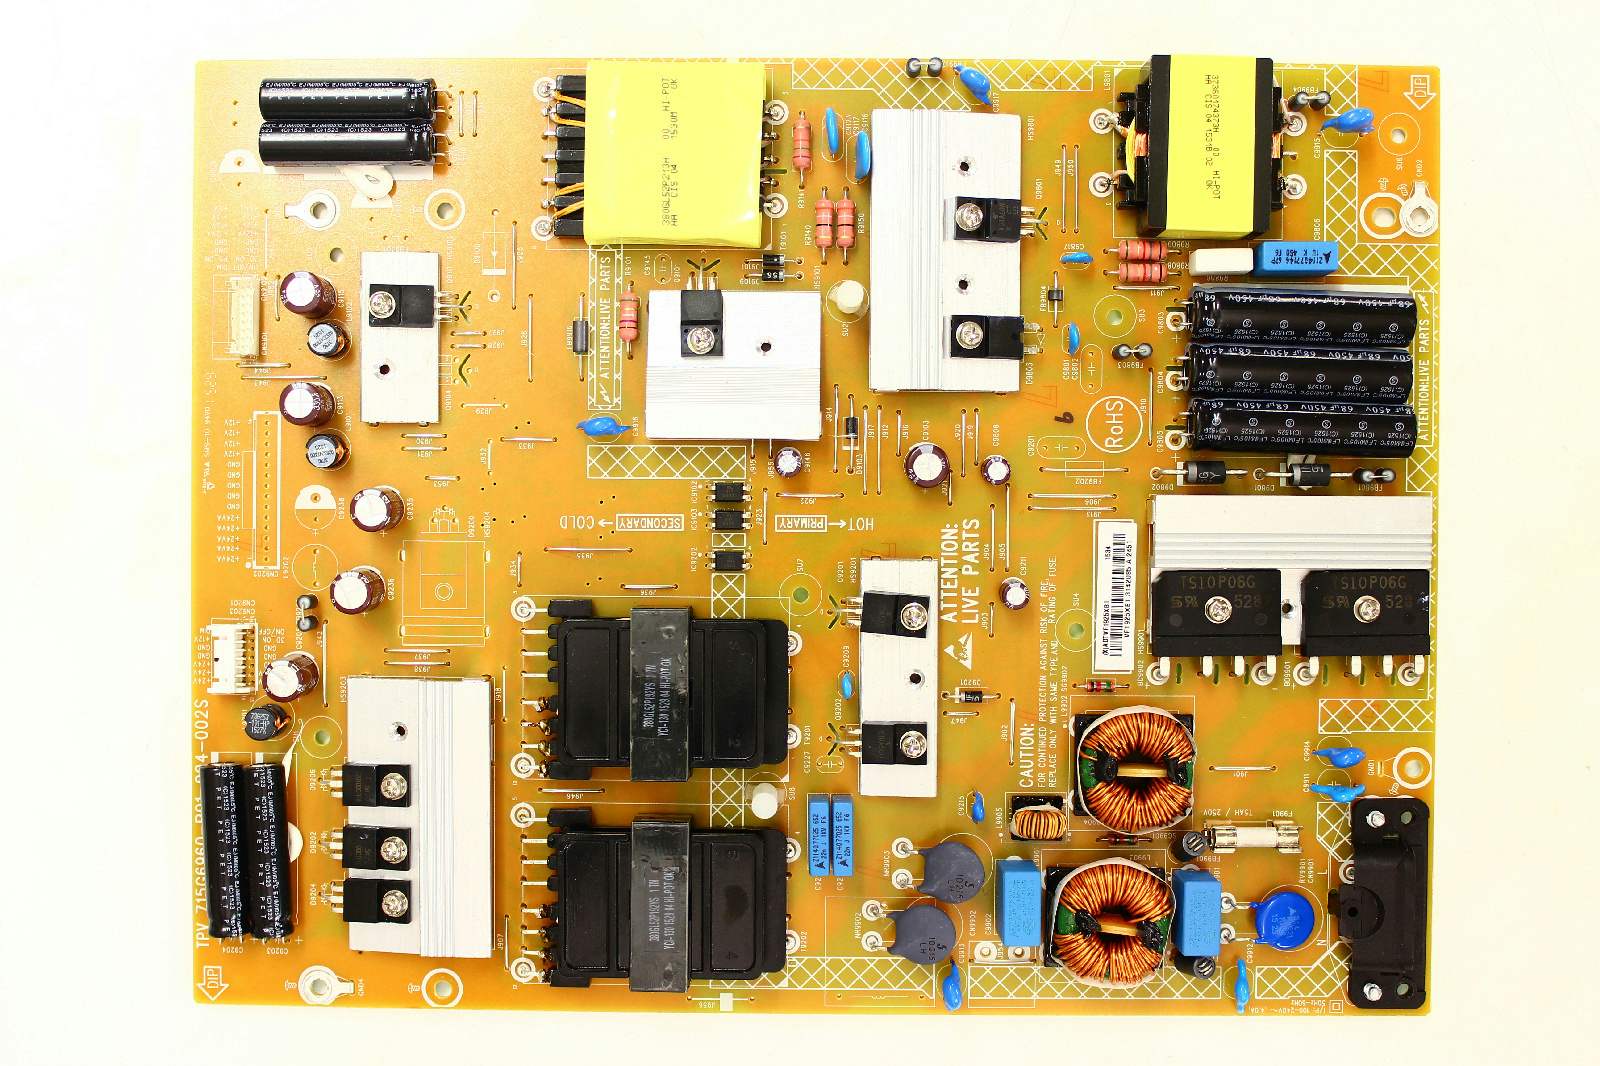 Vizio ADTVF1925XB1 Power Supply